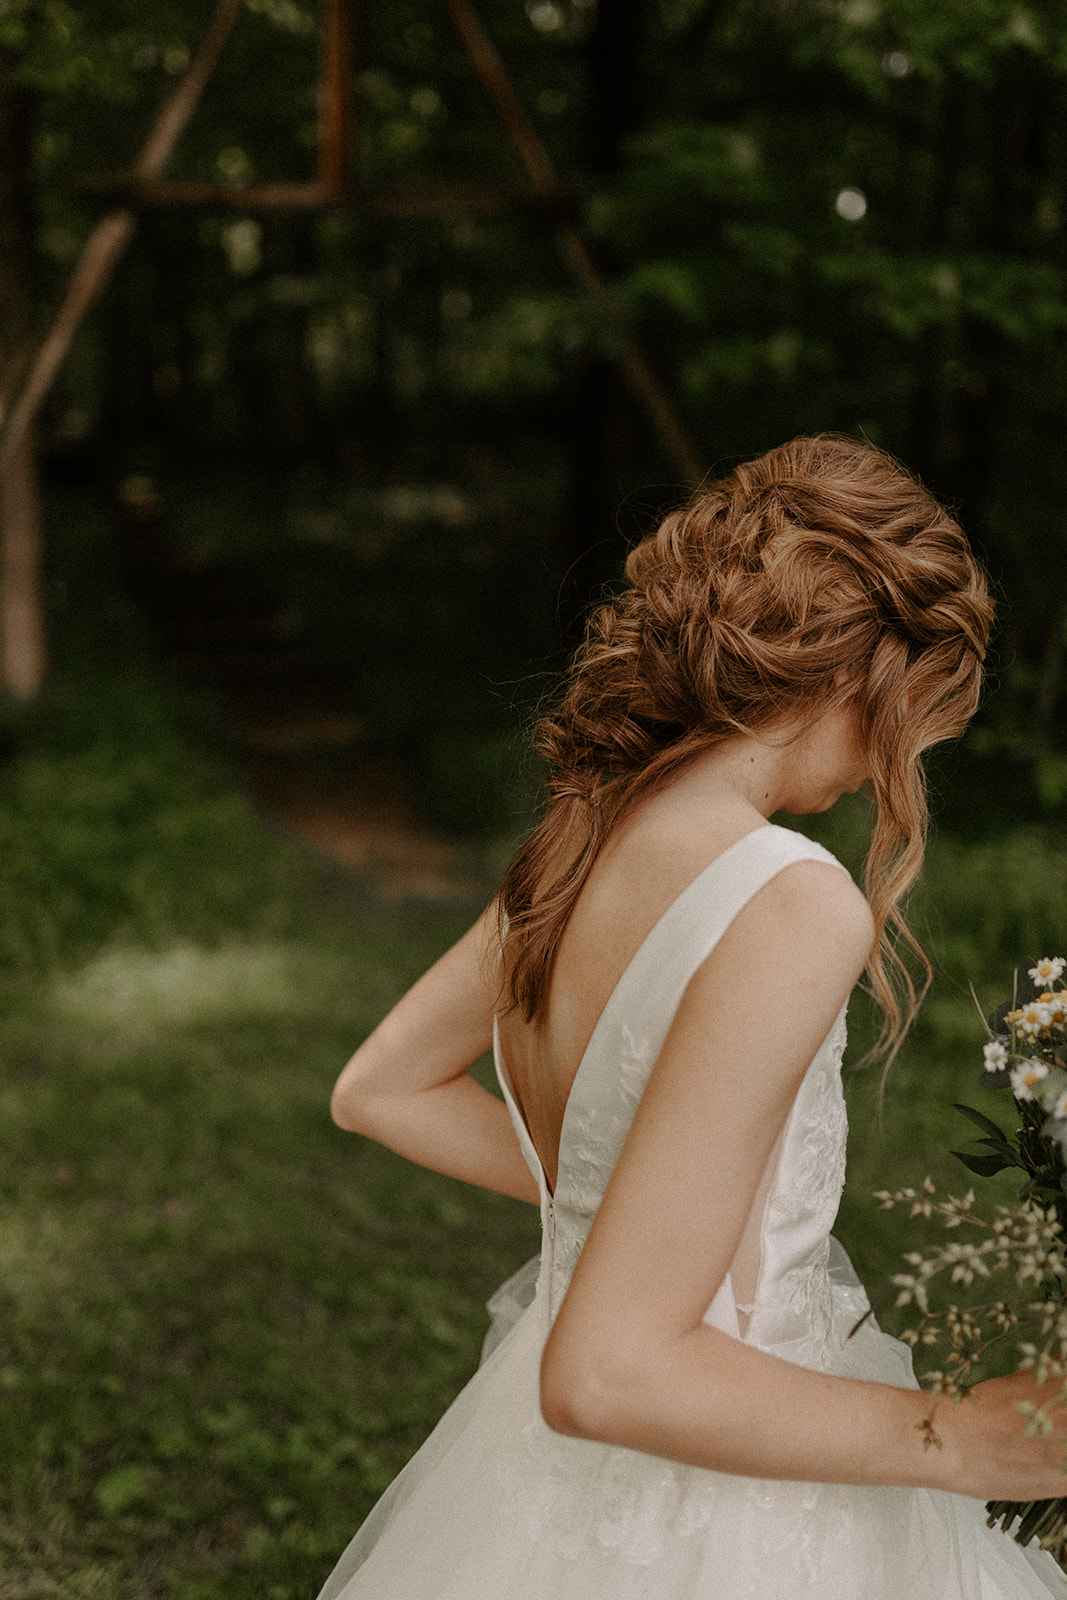 camp_wokanda_peoria_illinois_wedding_photographer_wright_photographs_bliese_0733.jpg